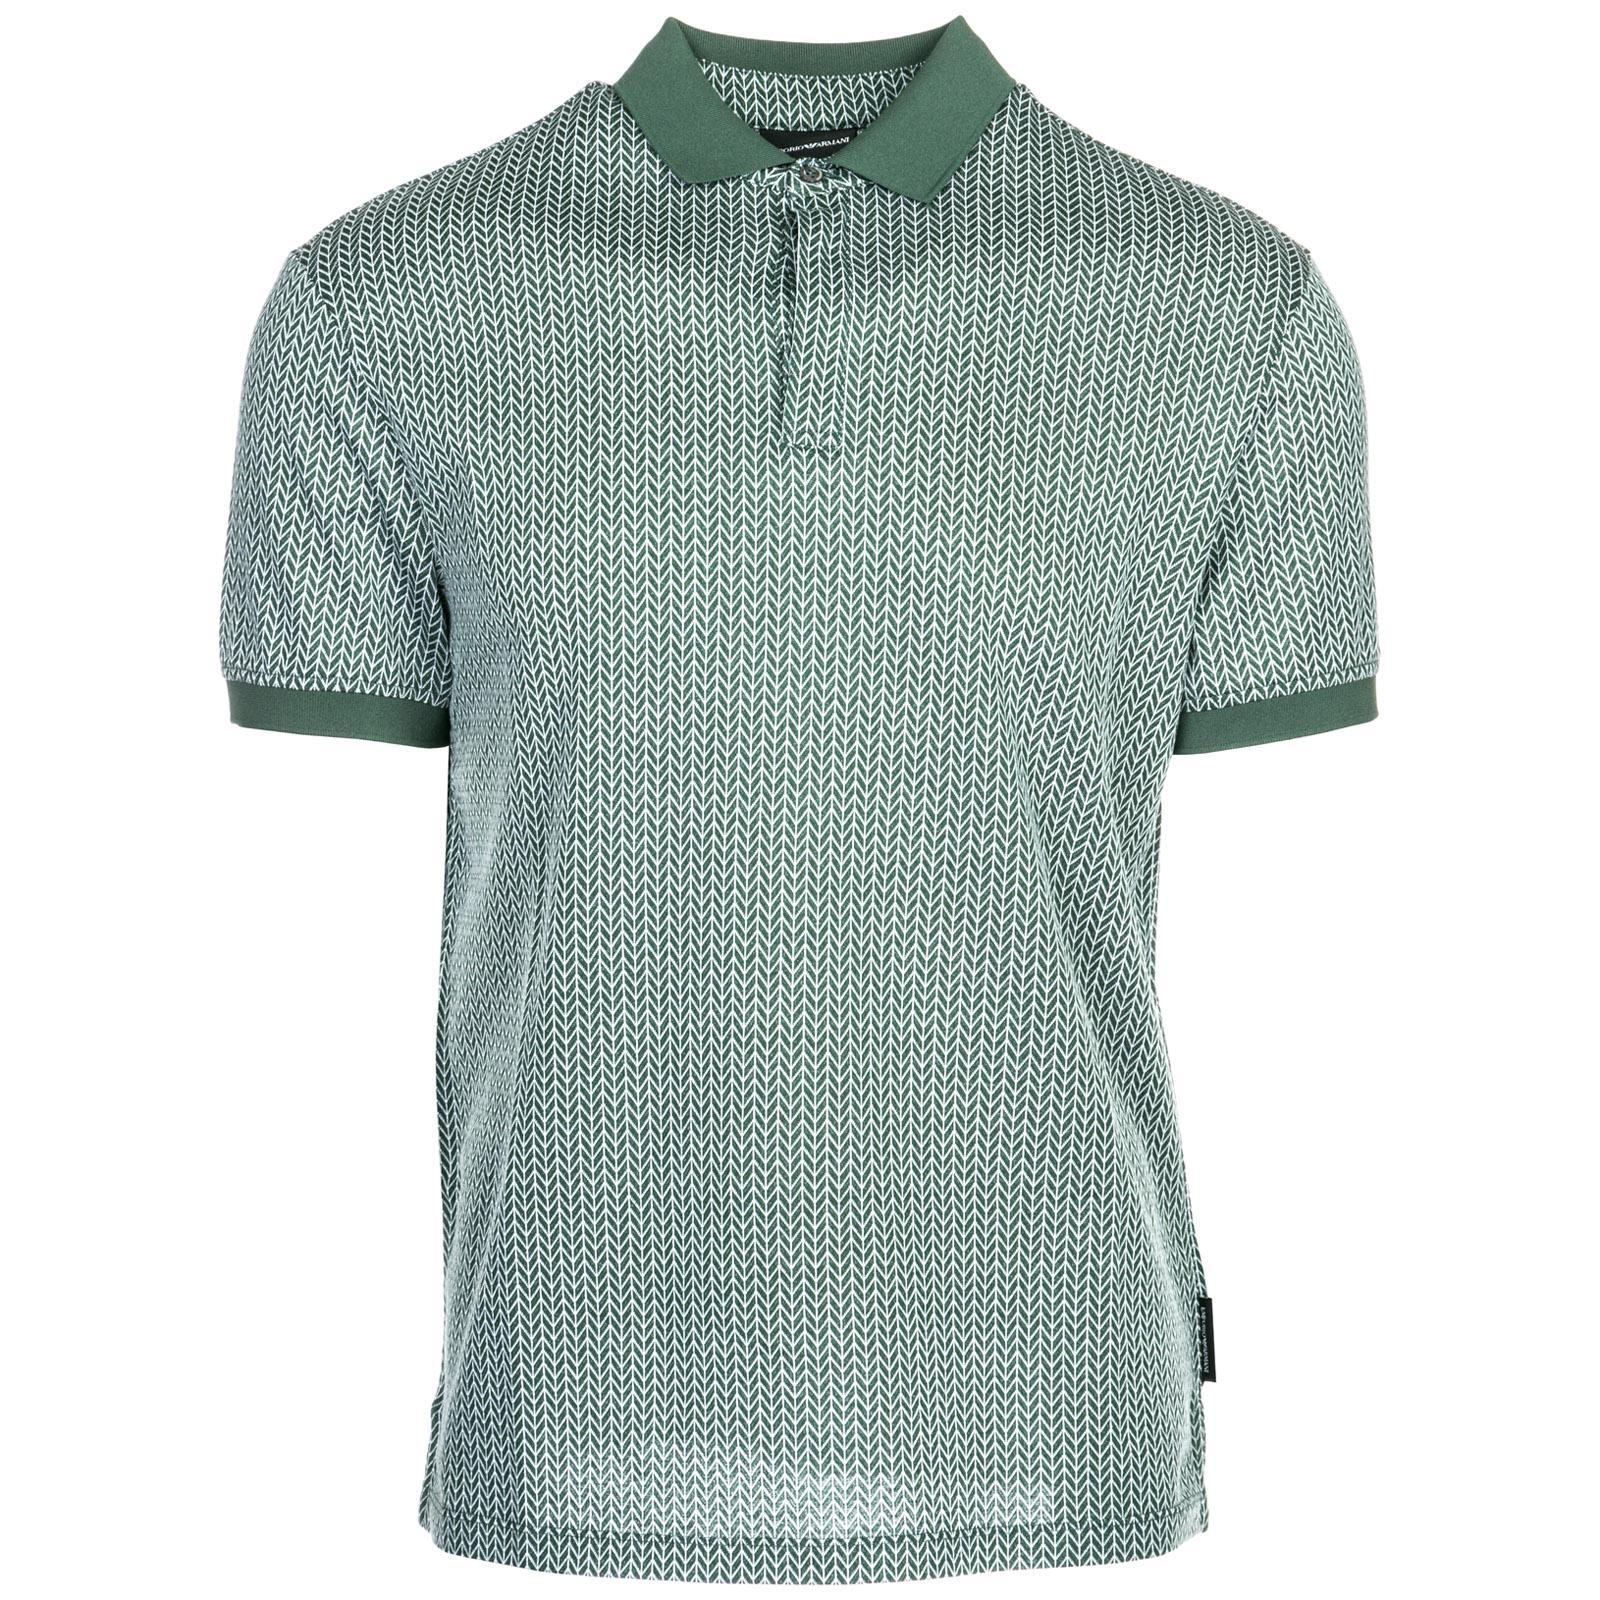 d8f8009e Lyst - Emporio Armani Short Sleeve T-shirt Polo Collar in Green for Men